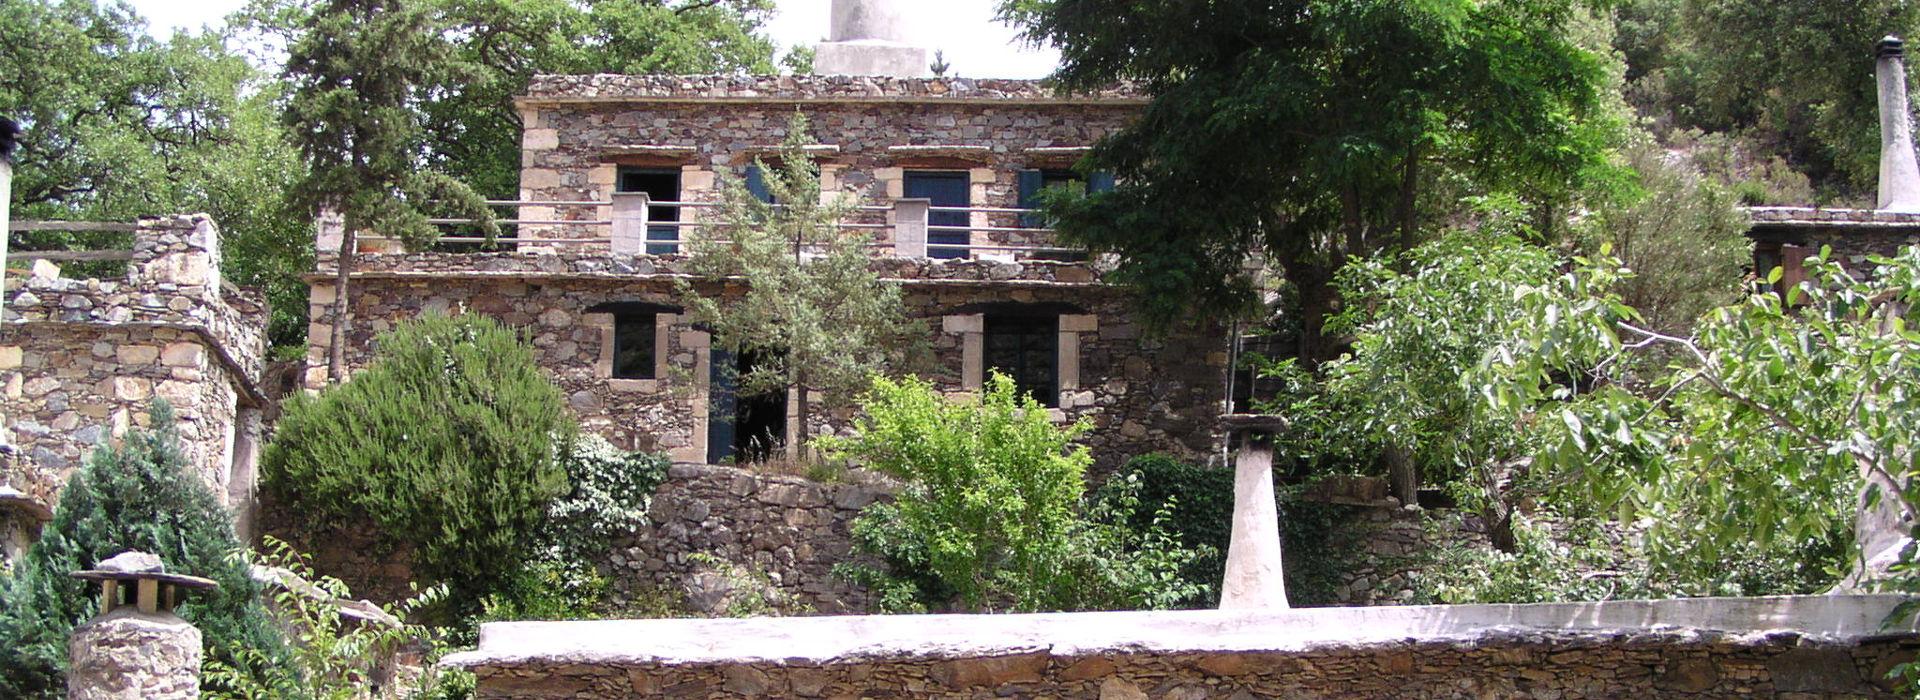 Restored Village of Milia